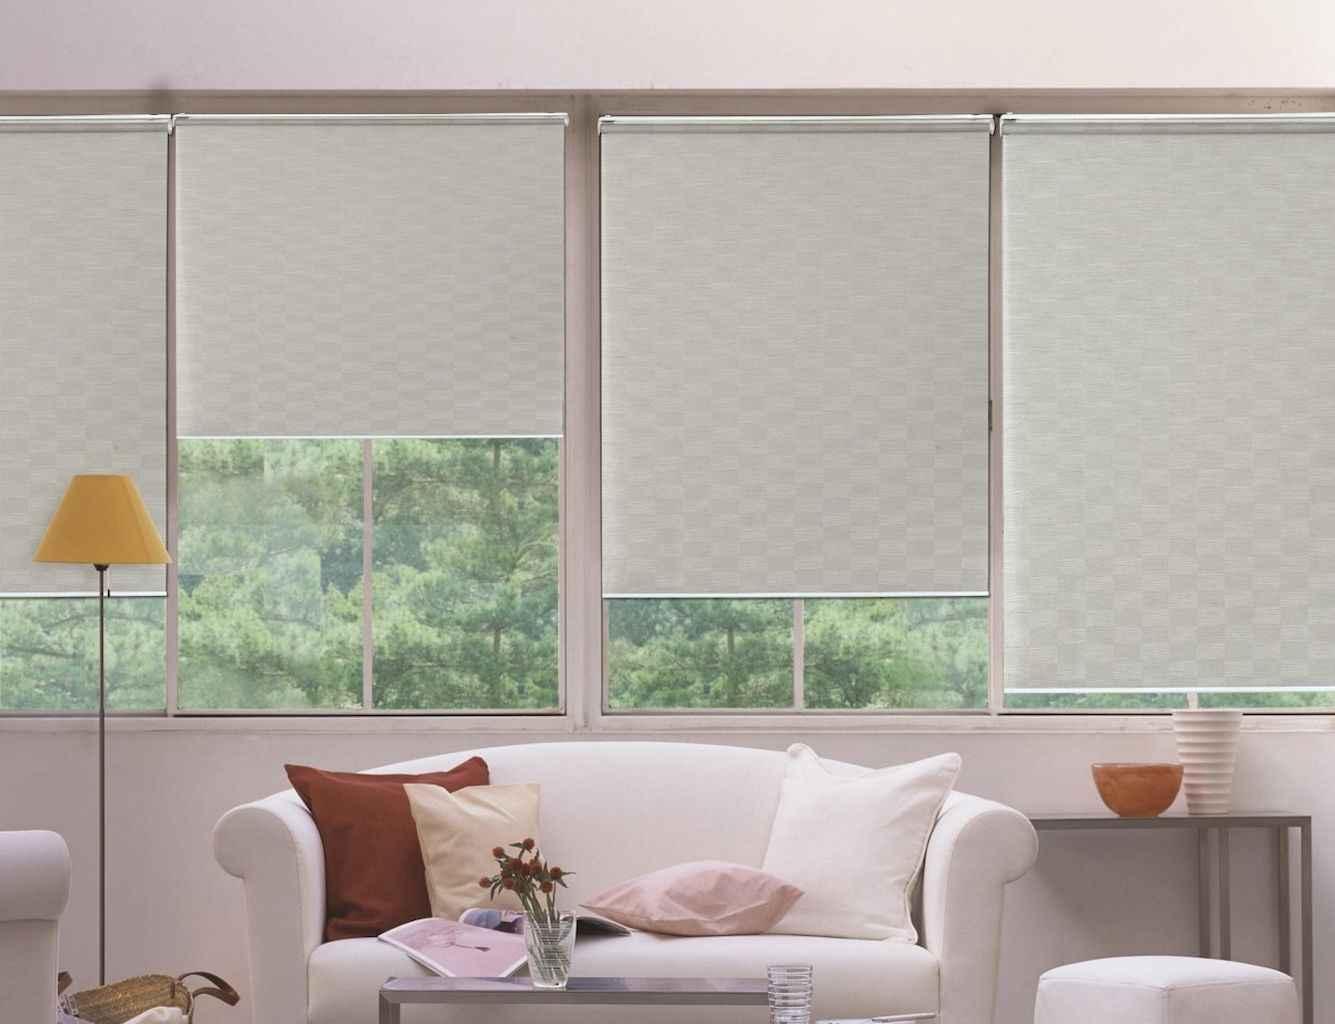 80 Elegant Harmony Interior Design Ideas For First Couple (45)